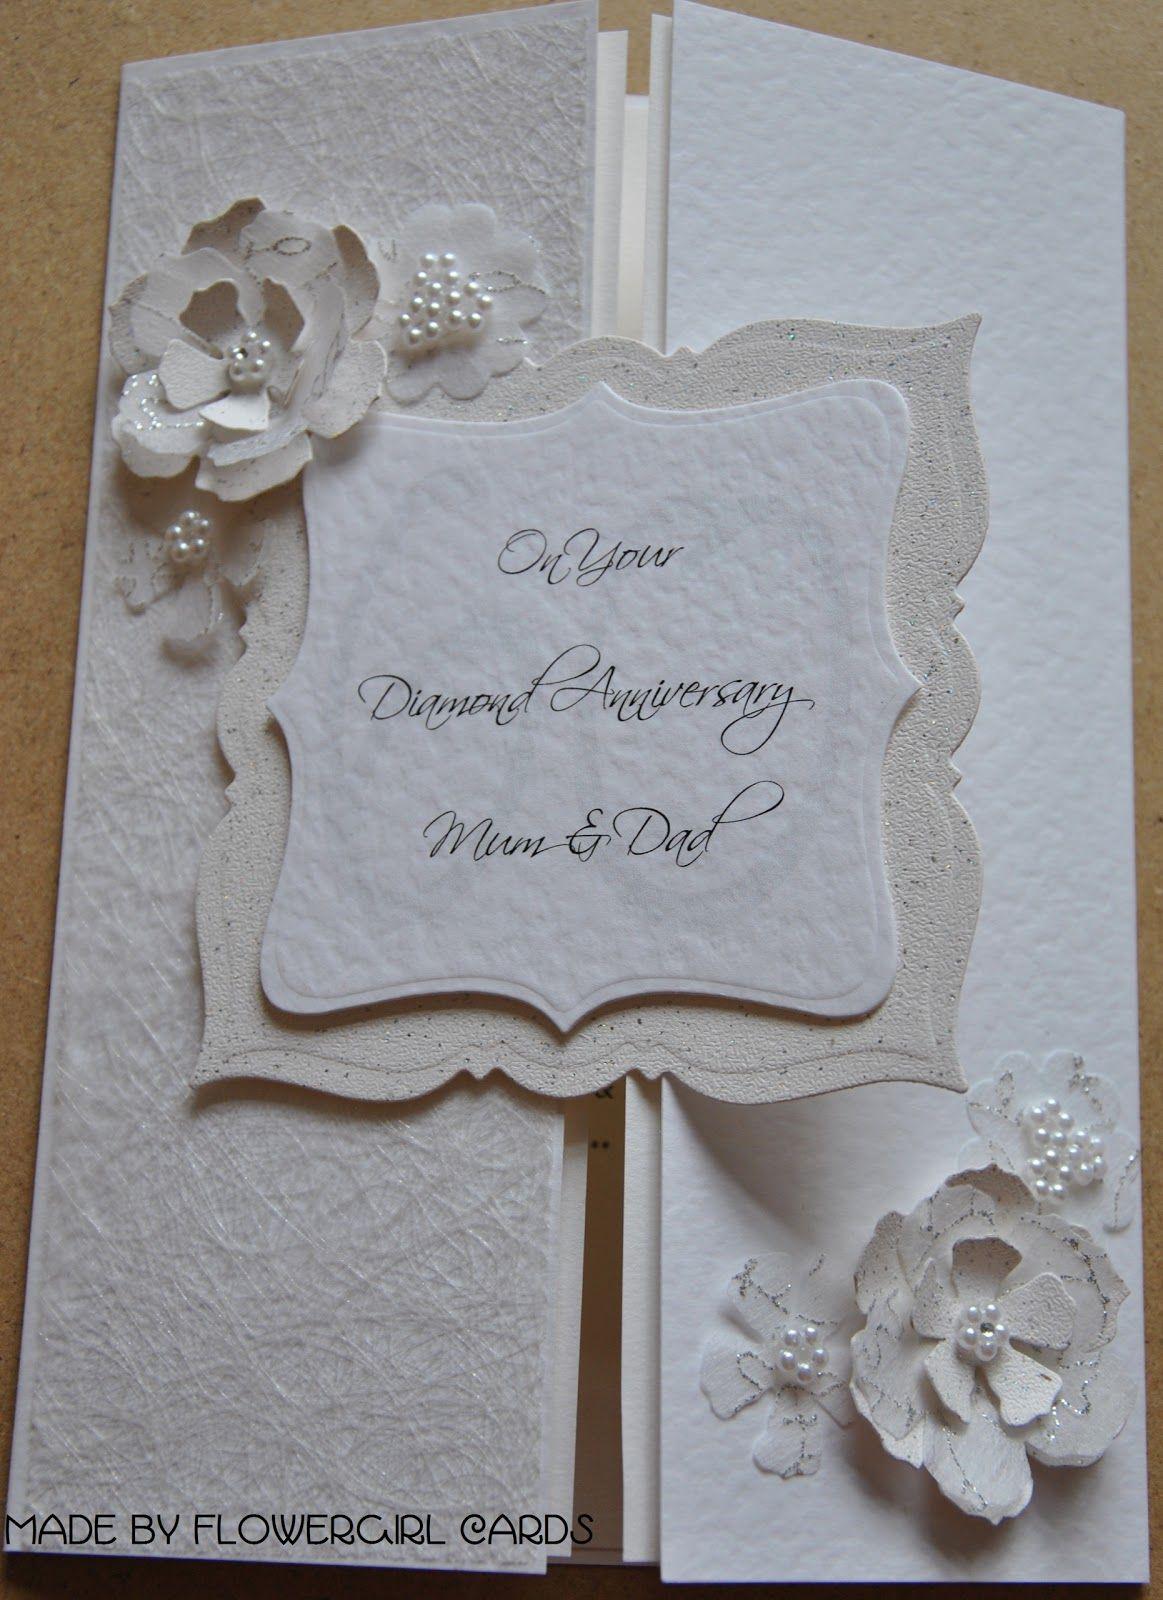 Diamond Anniversary Card Anniversary cards handmade